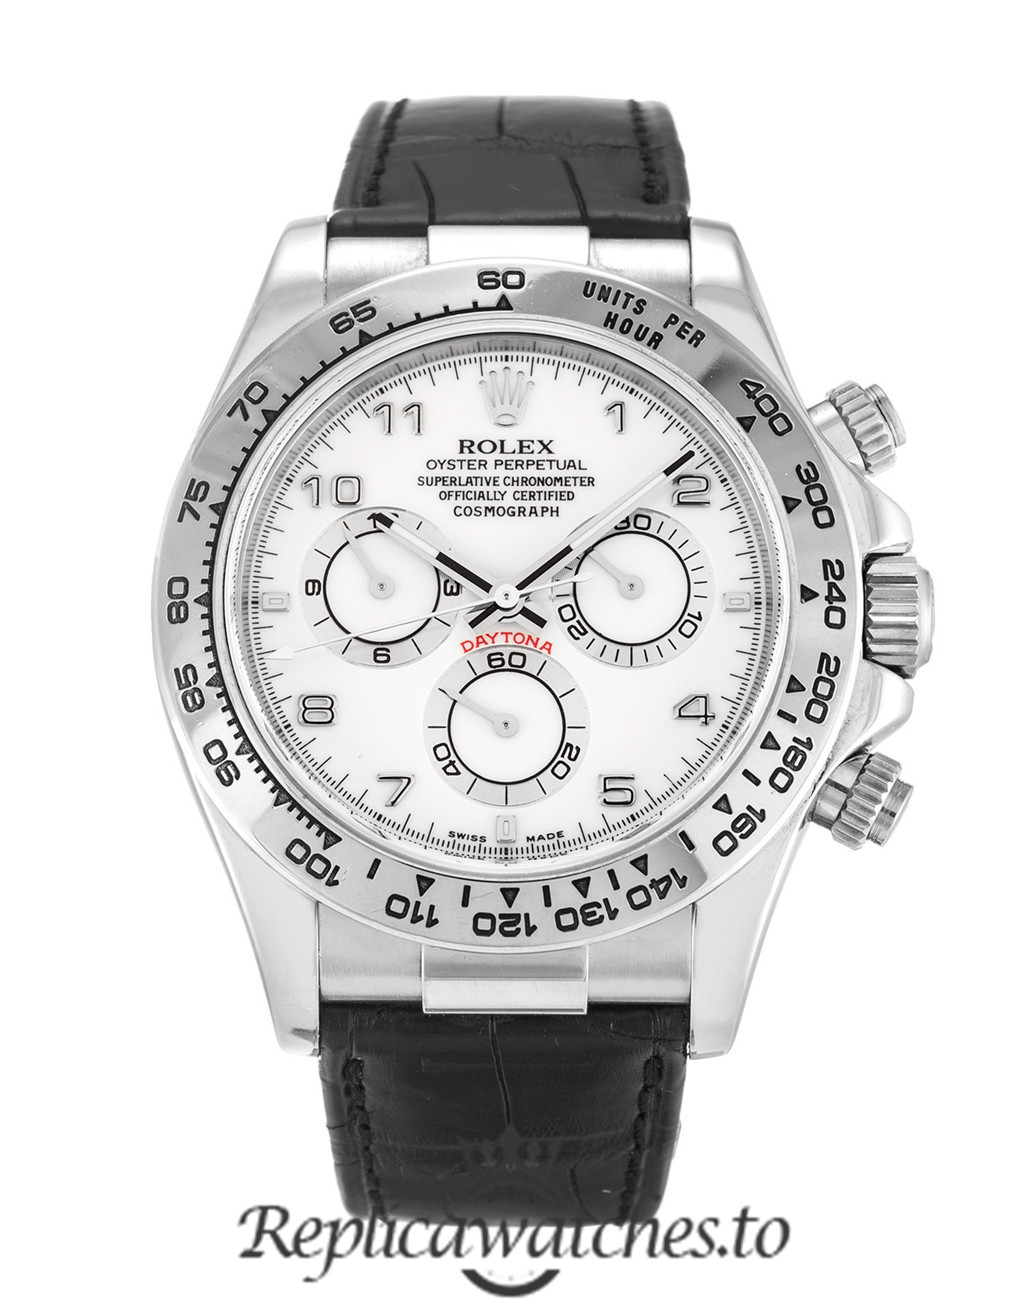 Rolex Daytona Replica 116519 002 Black Strap 40MM